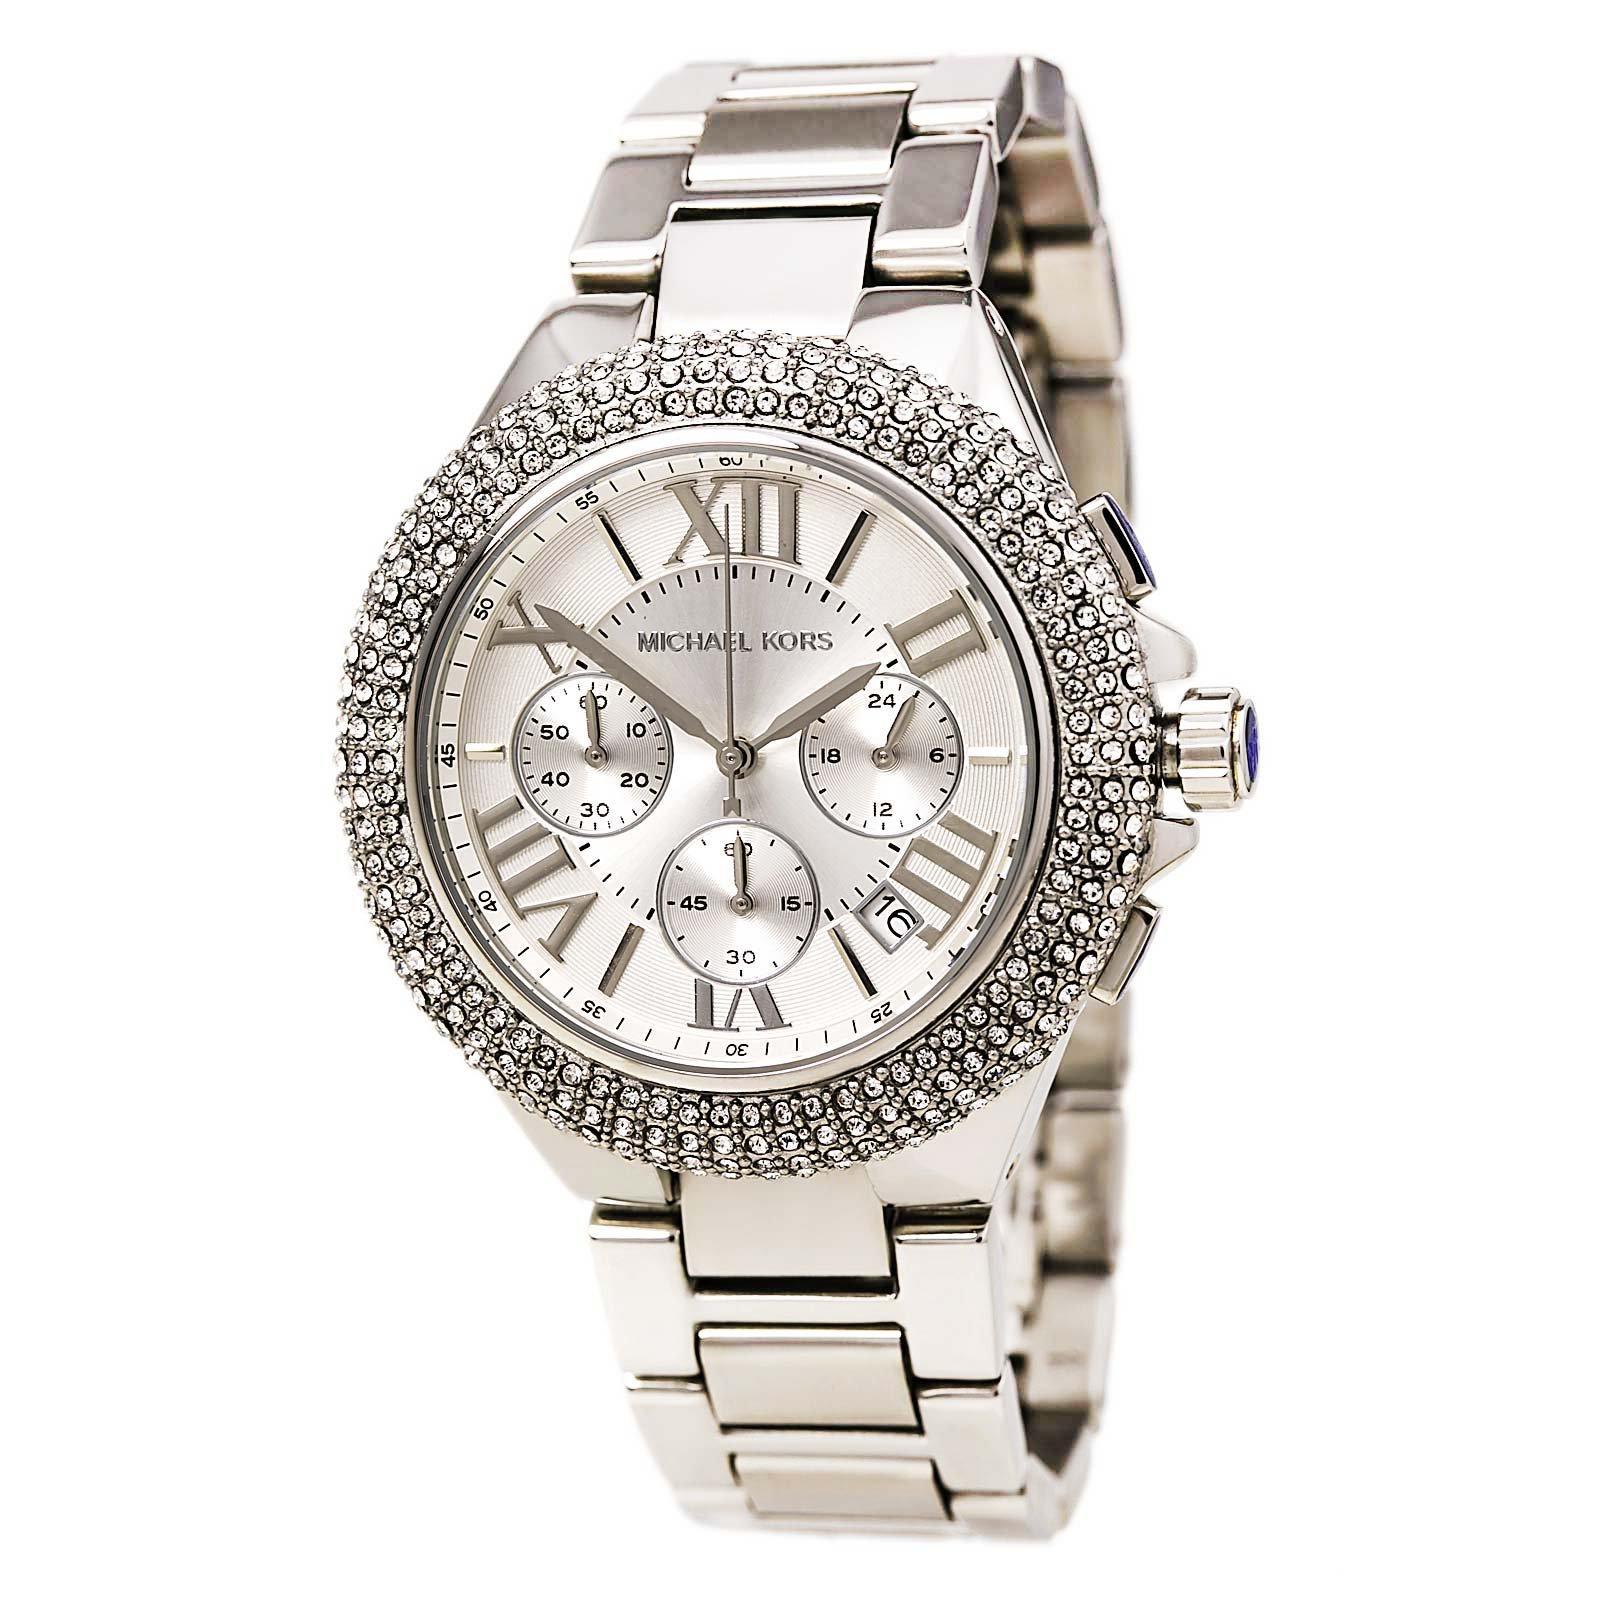 Michael Kors MK5634 Women's Chronograph Camille Stainless Steel Bracelet Watch